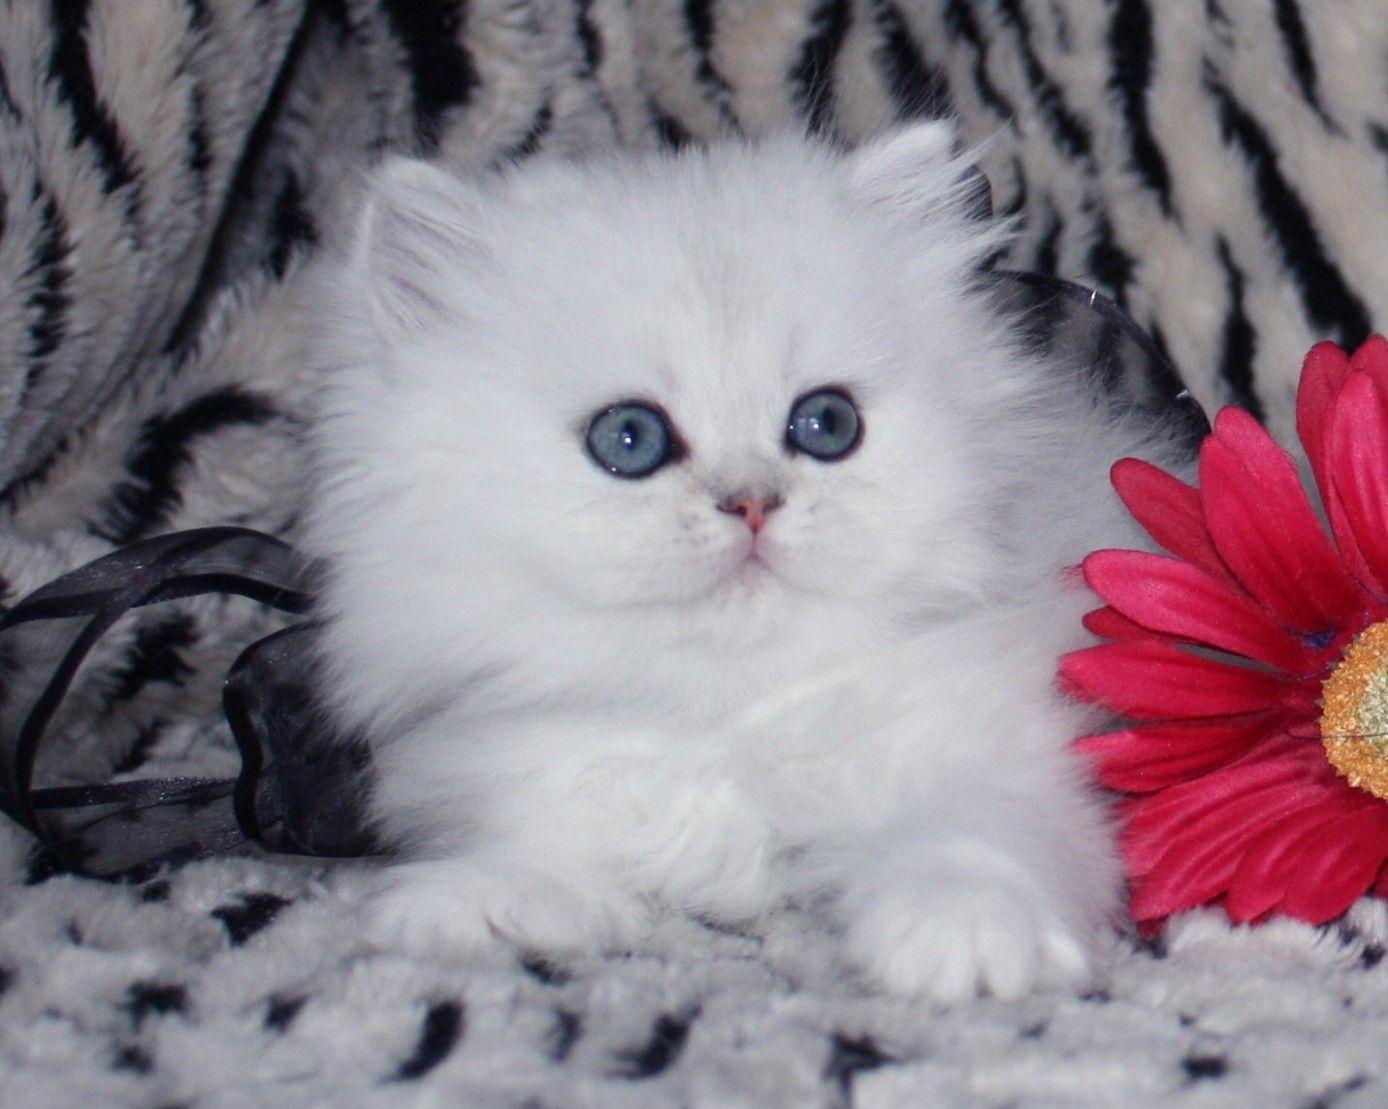 10 Cute Persian Teacup Kittens For Sale Near Me In 2020 Persian Kittens Pretty Cats Kittens